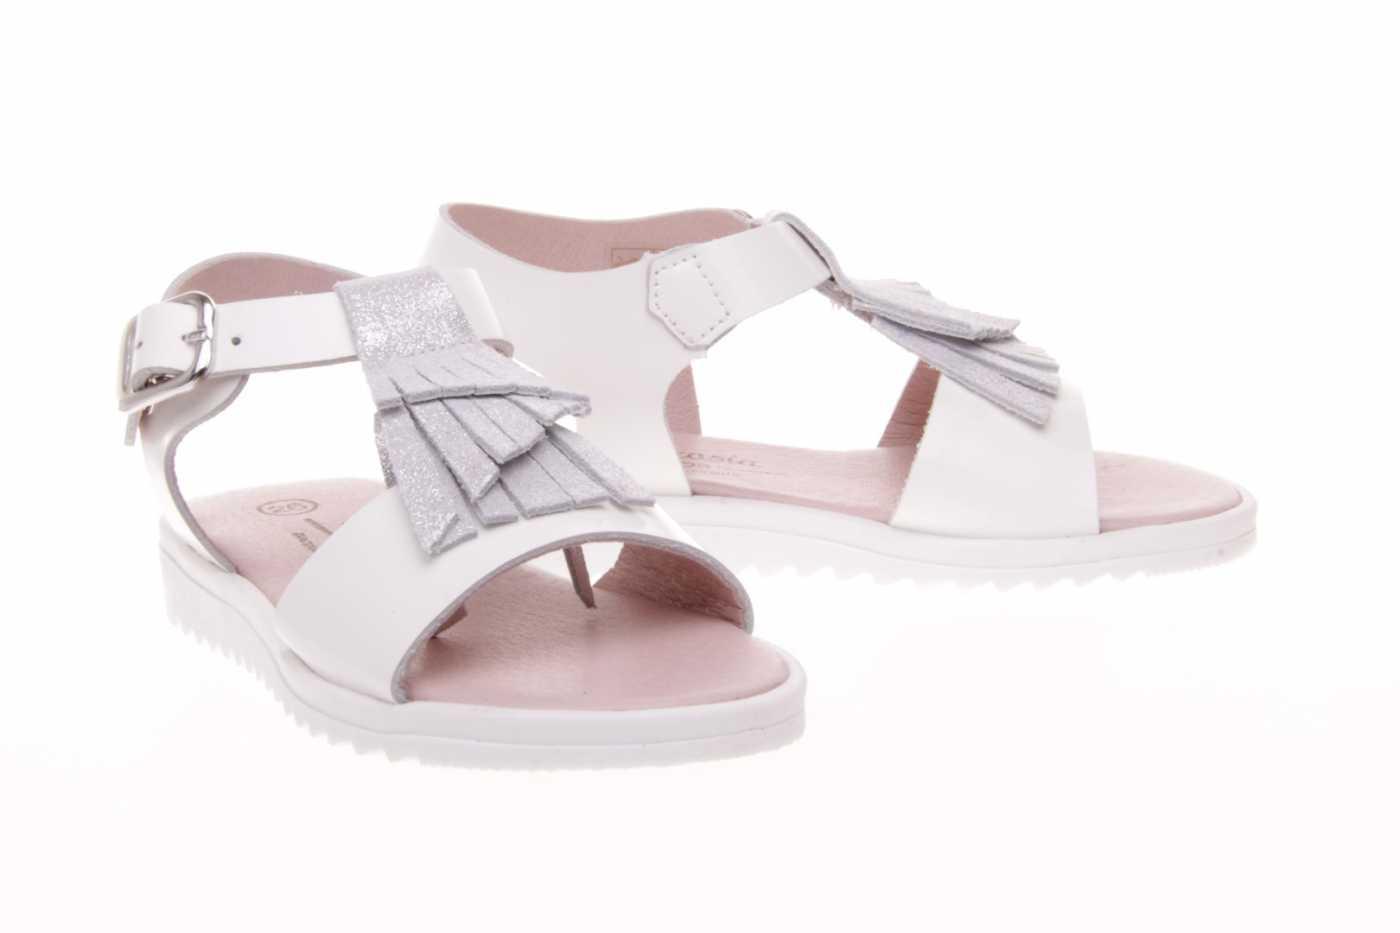 Comprar Sandalia Tipo Zapato Niña Color Joven Blanco V8m0wnn Estilo 80wOPkNZnX